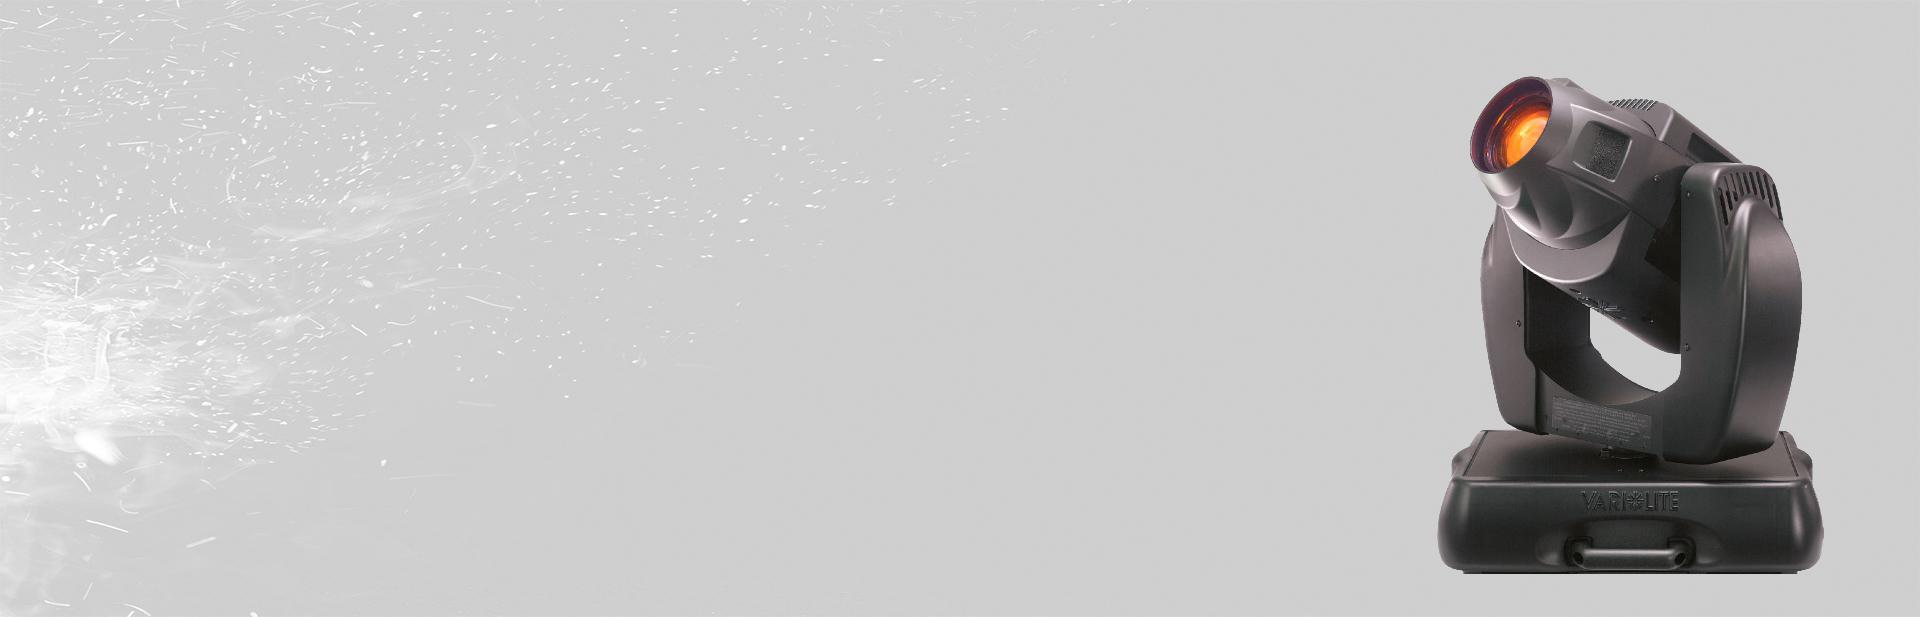 VARI-LITE VL2500 SPOT LUMINAIRE